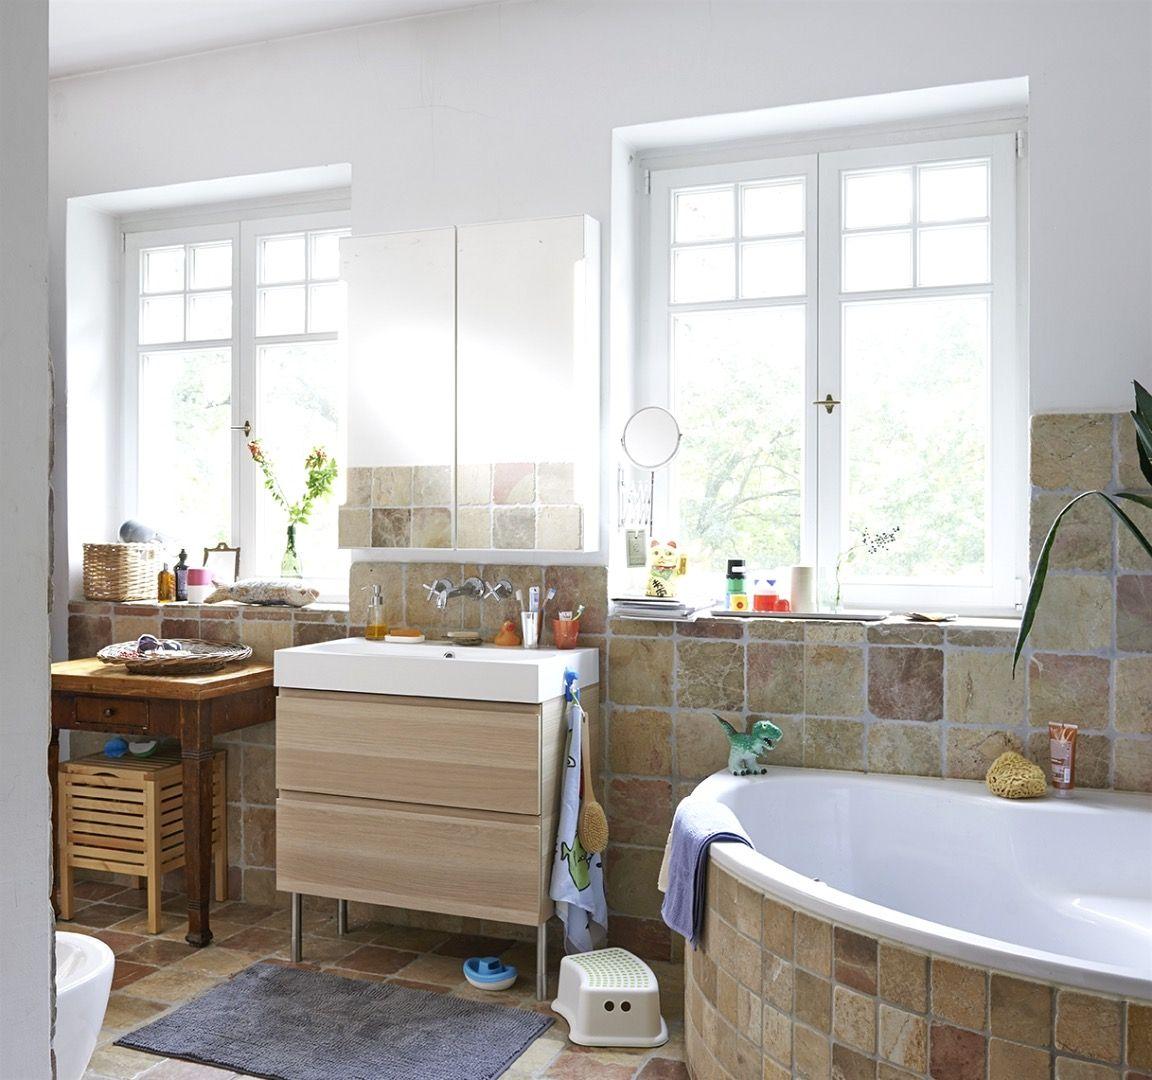 Maisonette-design-bilder ideen badezimmer ikea  dream house  pinterest  house